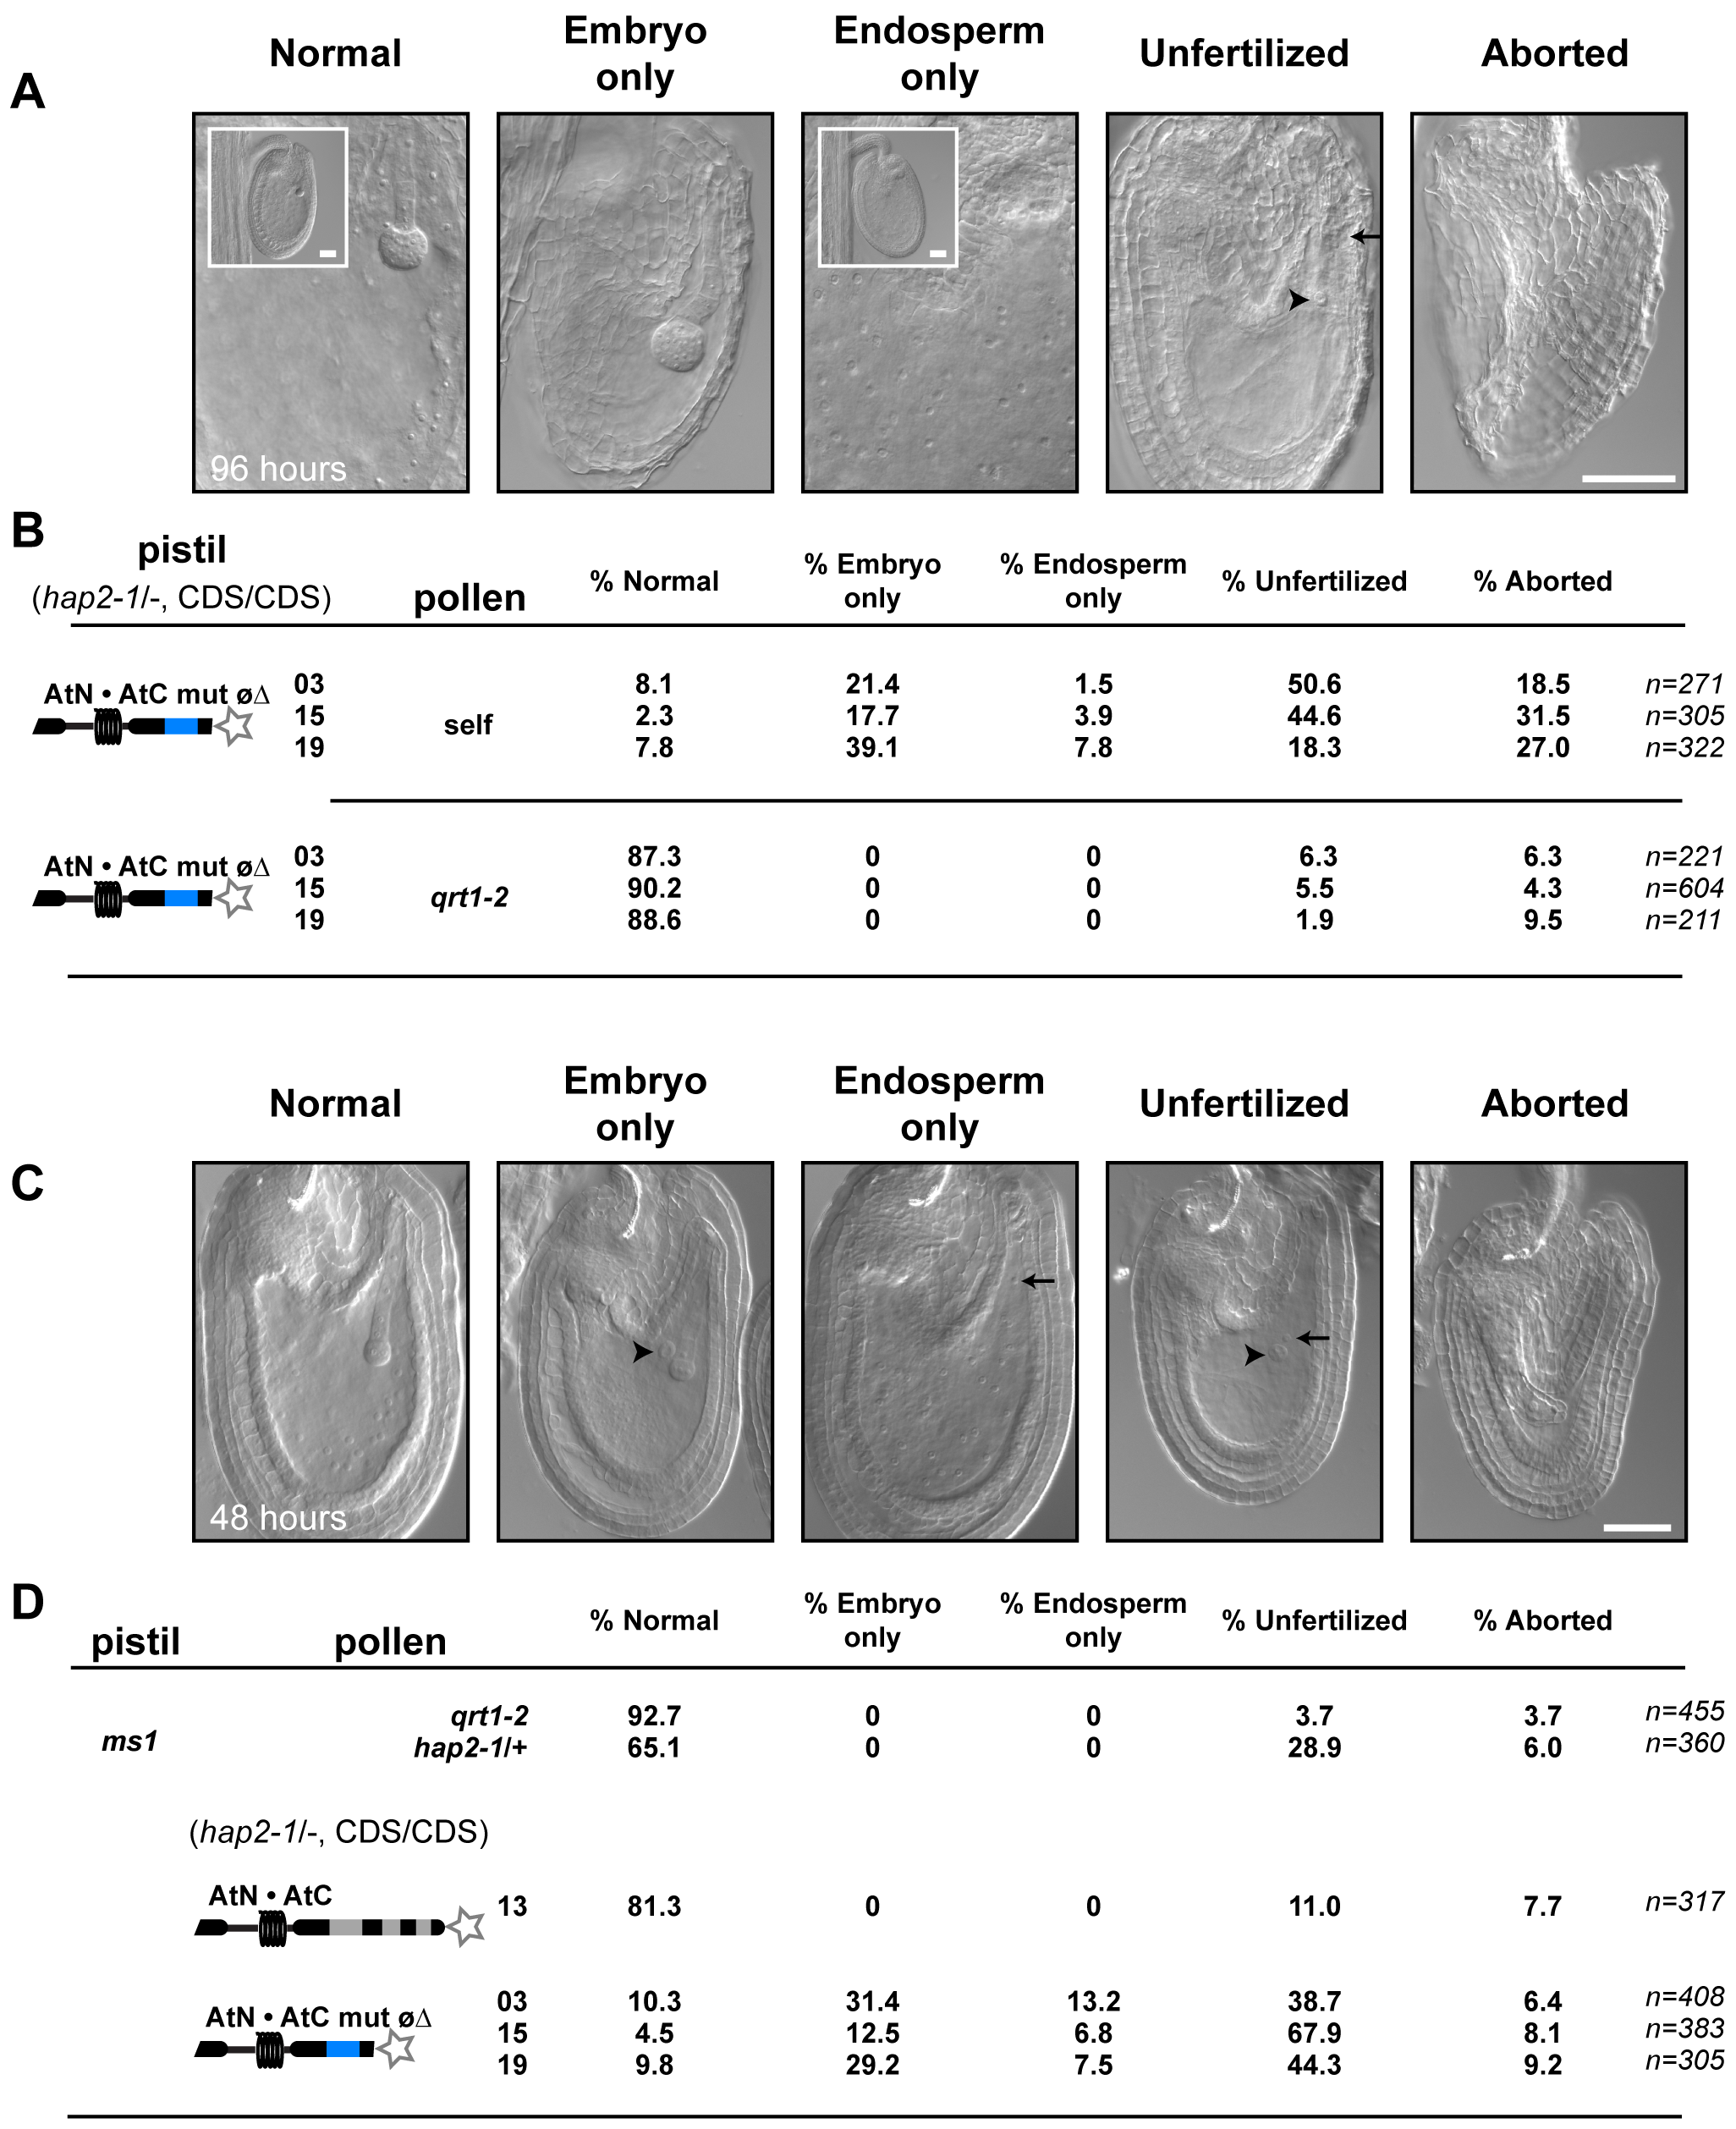 AtN•AtC mut øΔ, <i>hap2-1</i> sperm are defective at double fertilization.